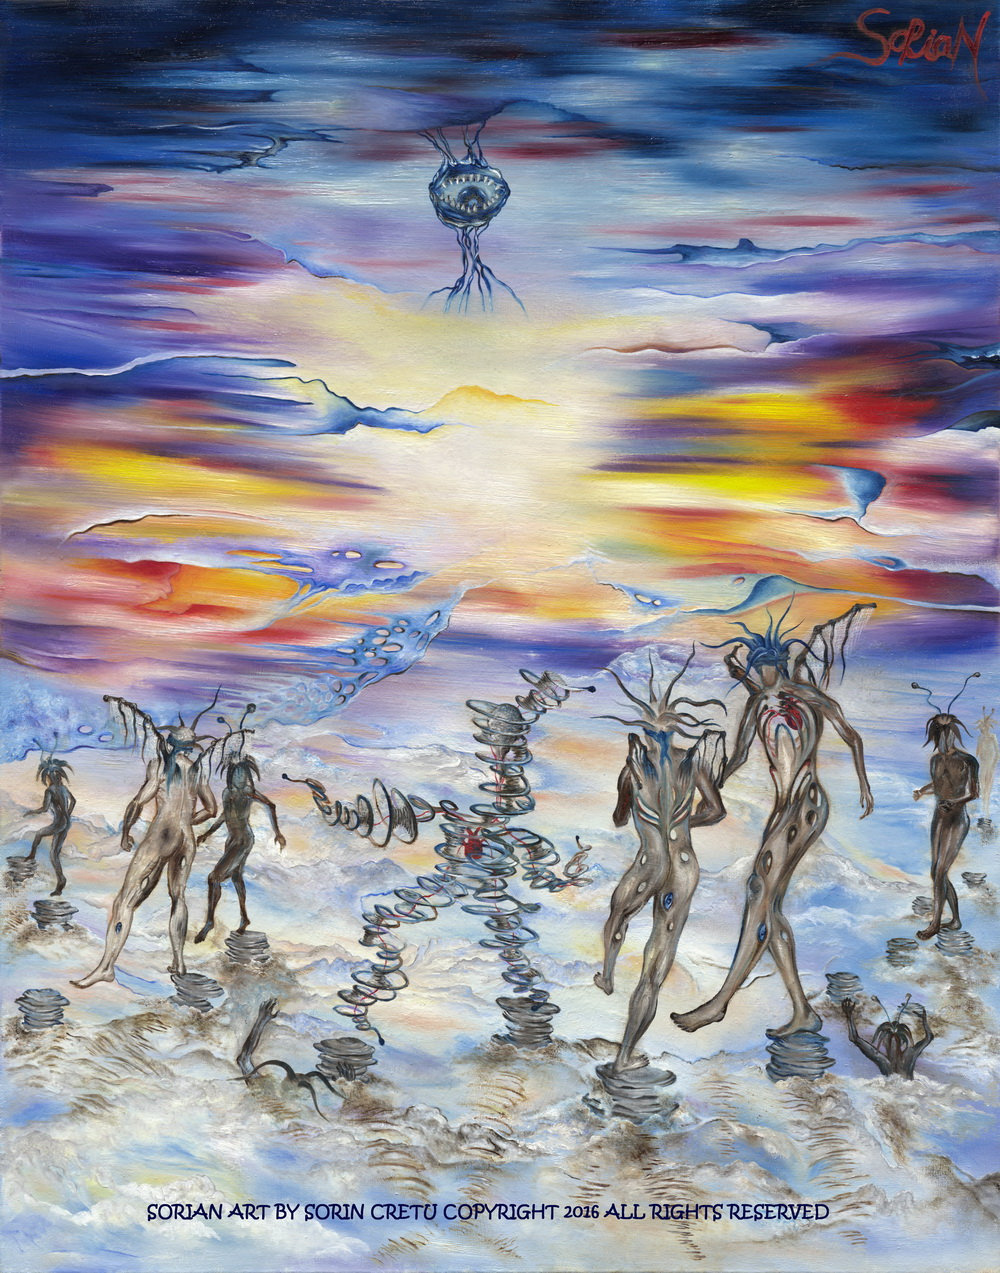 Blind Dreamers - SORiaN (Sorin Cretu) - 2016 - Size 28x22 inch - very small.jpg